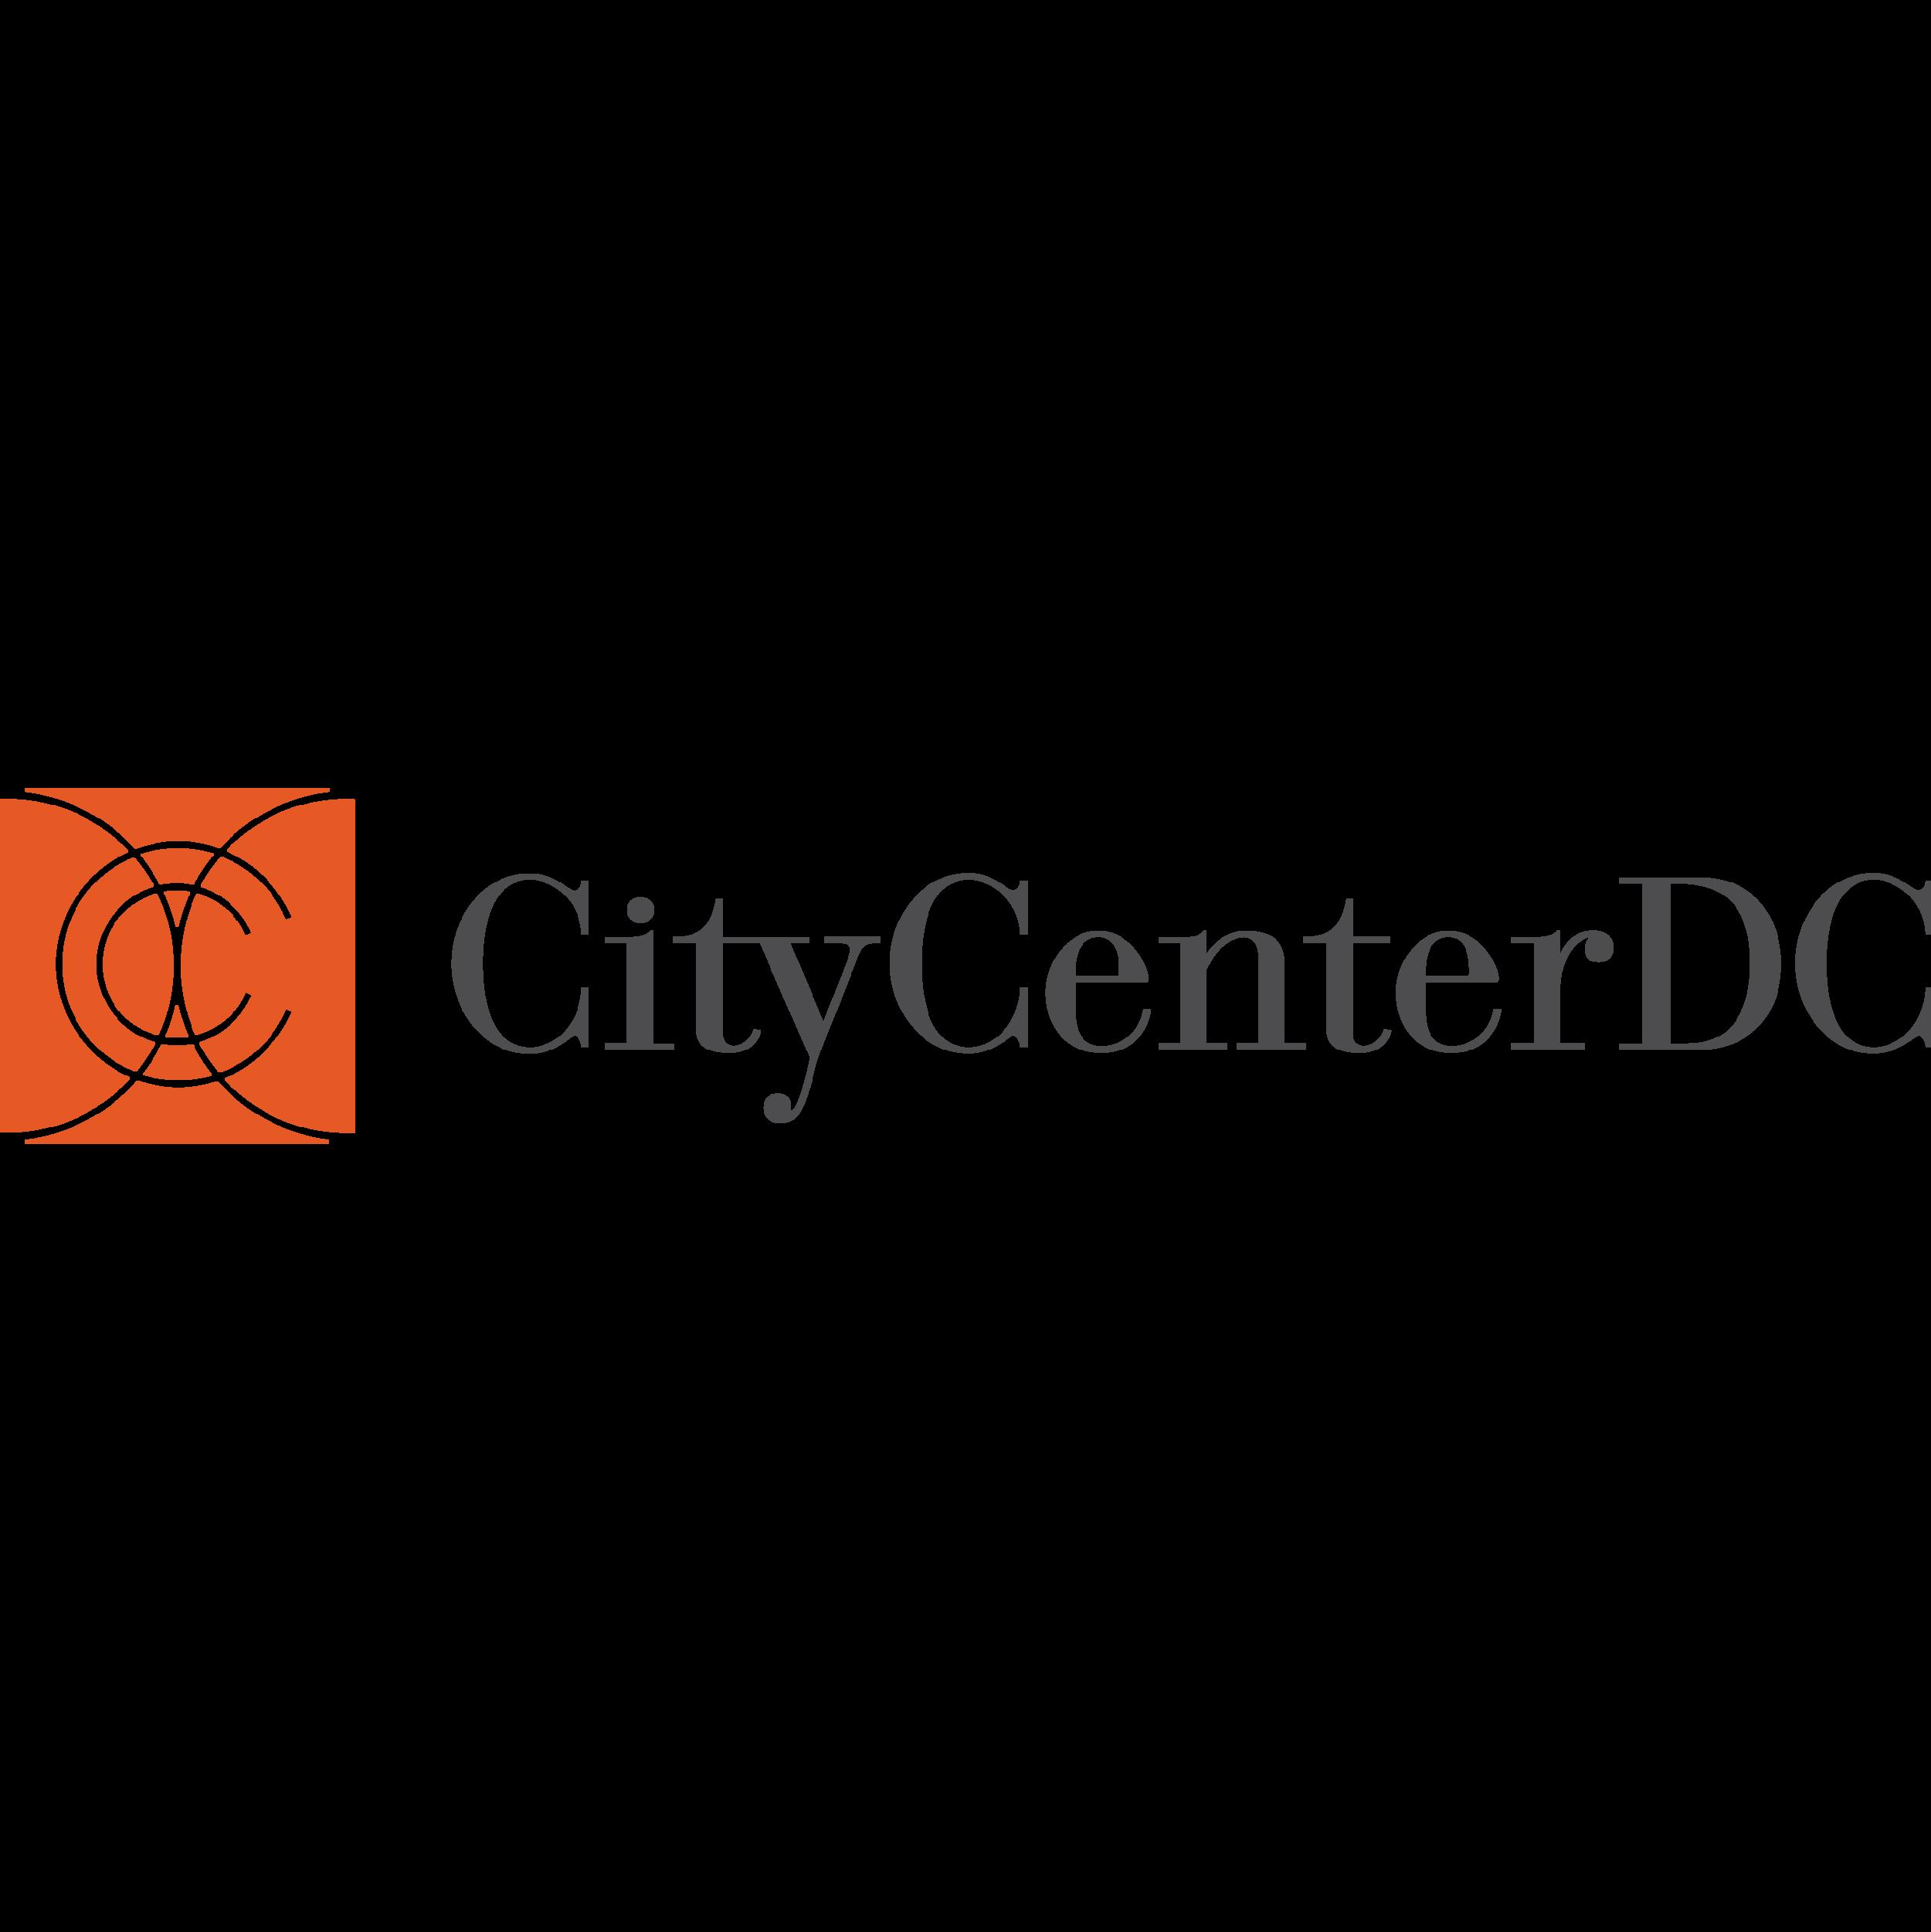 CityCenterDC-LogoSQ-01.png